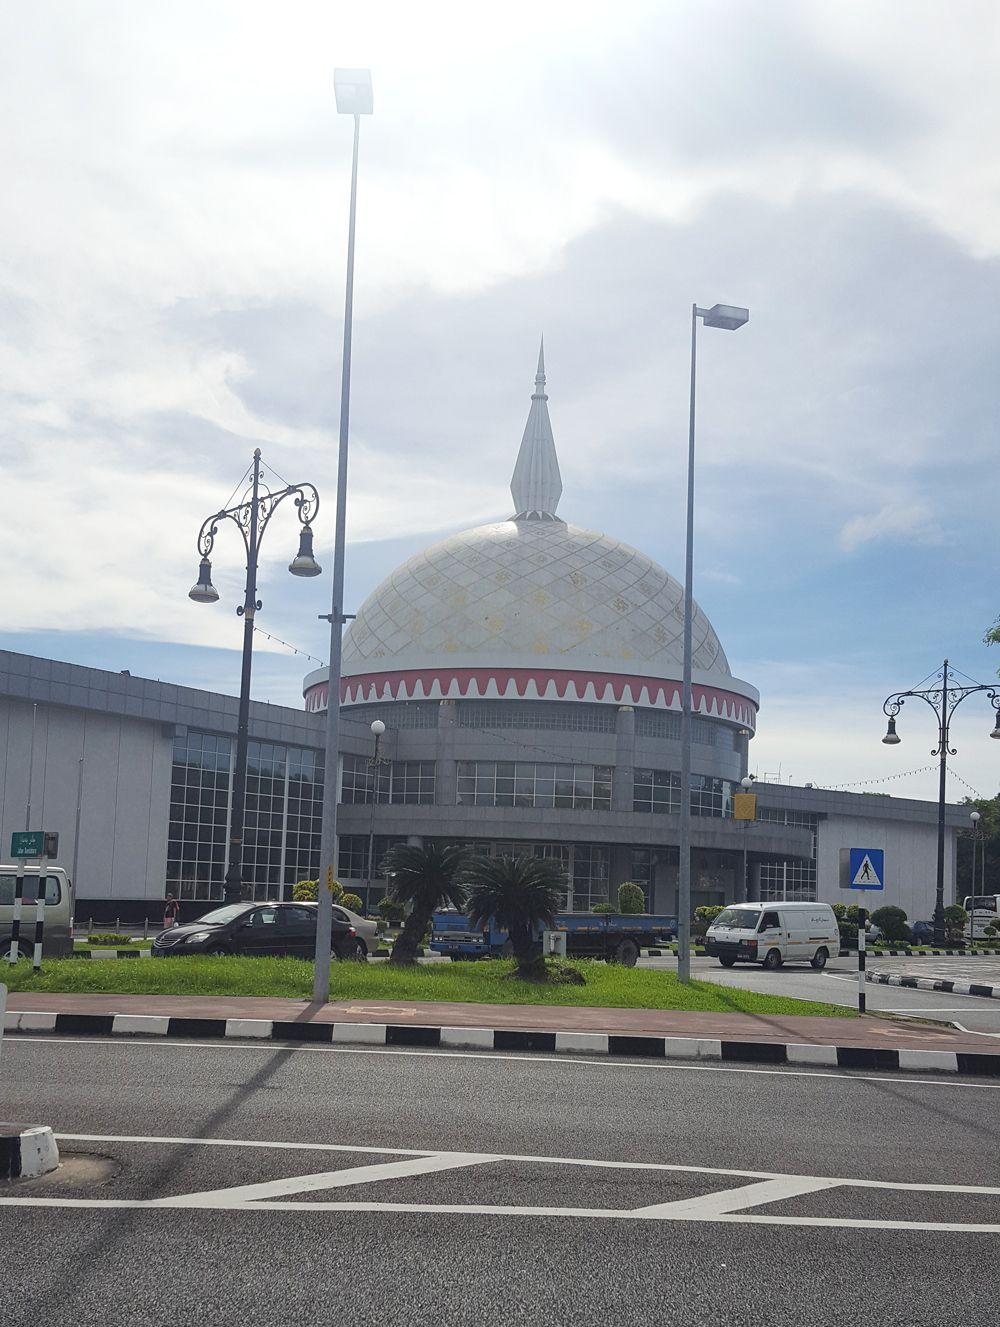 Du lịch bụi Brunei - Bảo tàng Brunei Royal Regalia